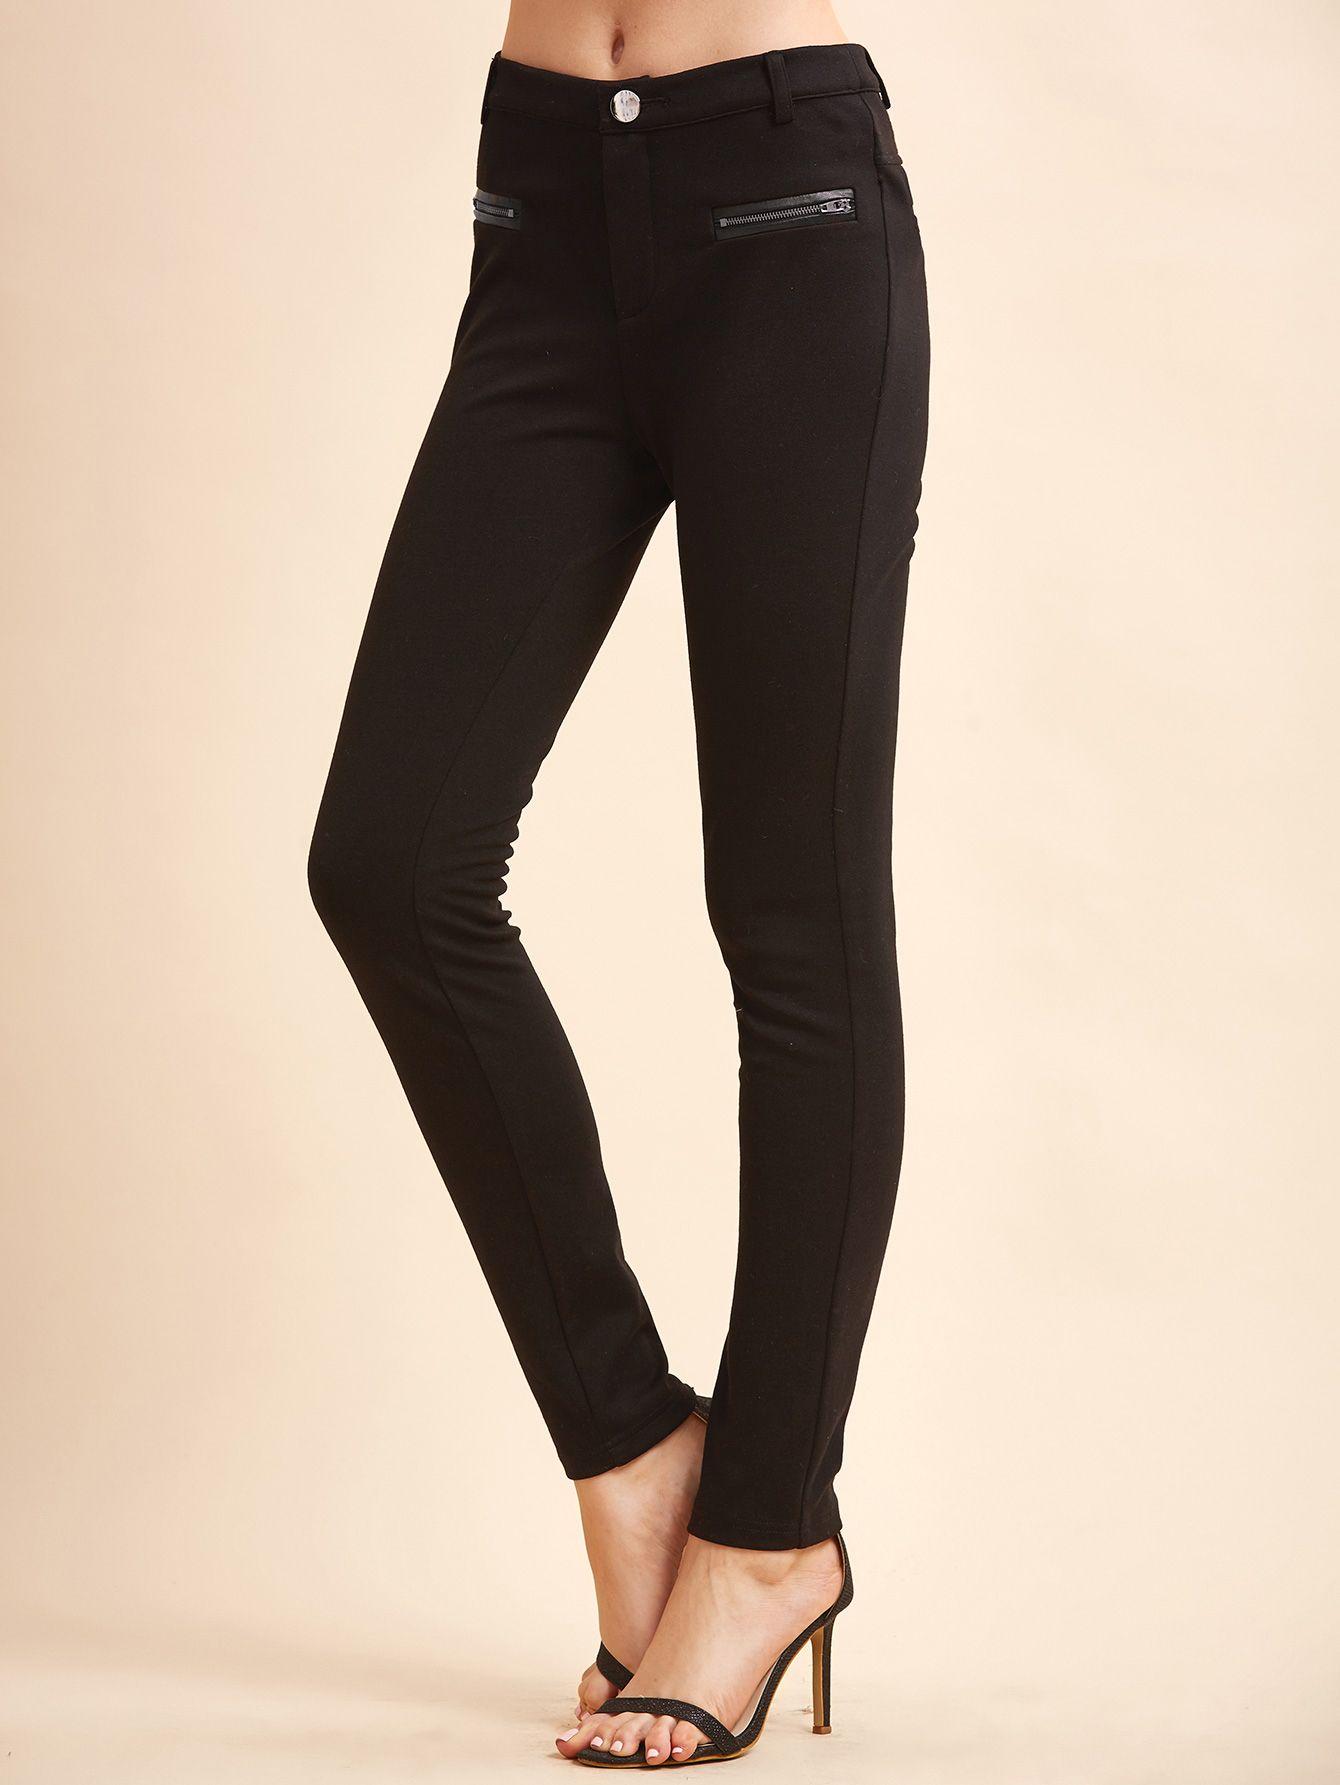 Black Skinny Pants With Zipper Pockets — 19.89 € ----------------color: Black size: L,M,S,XS